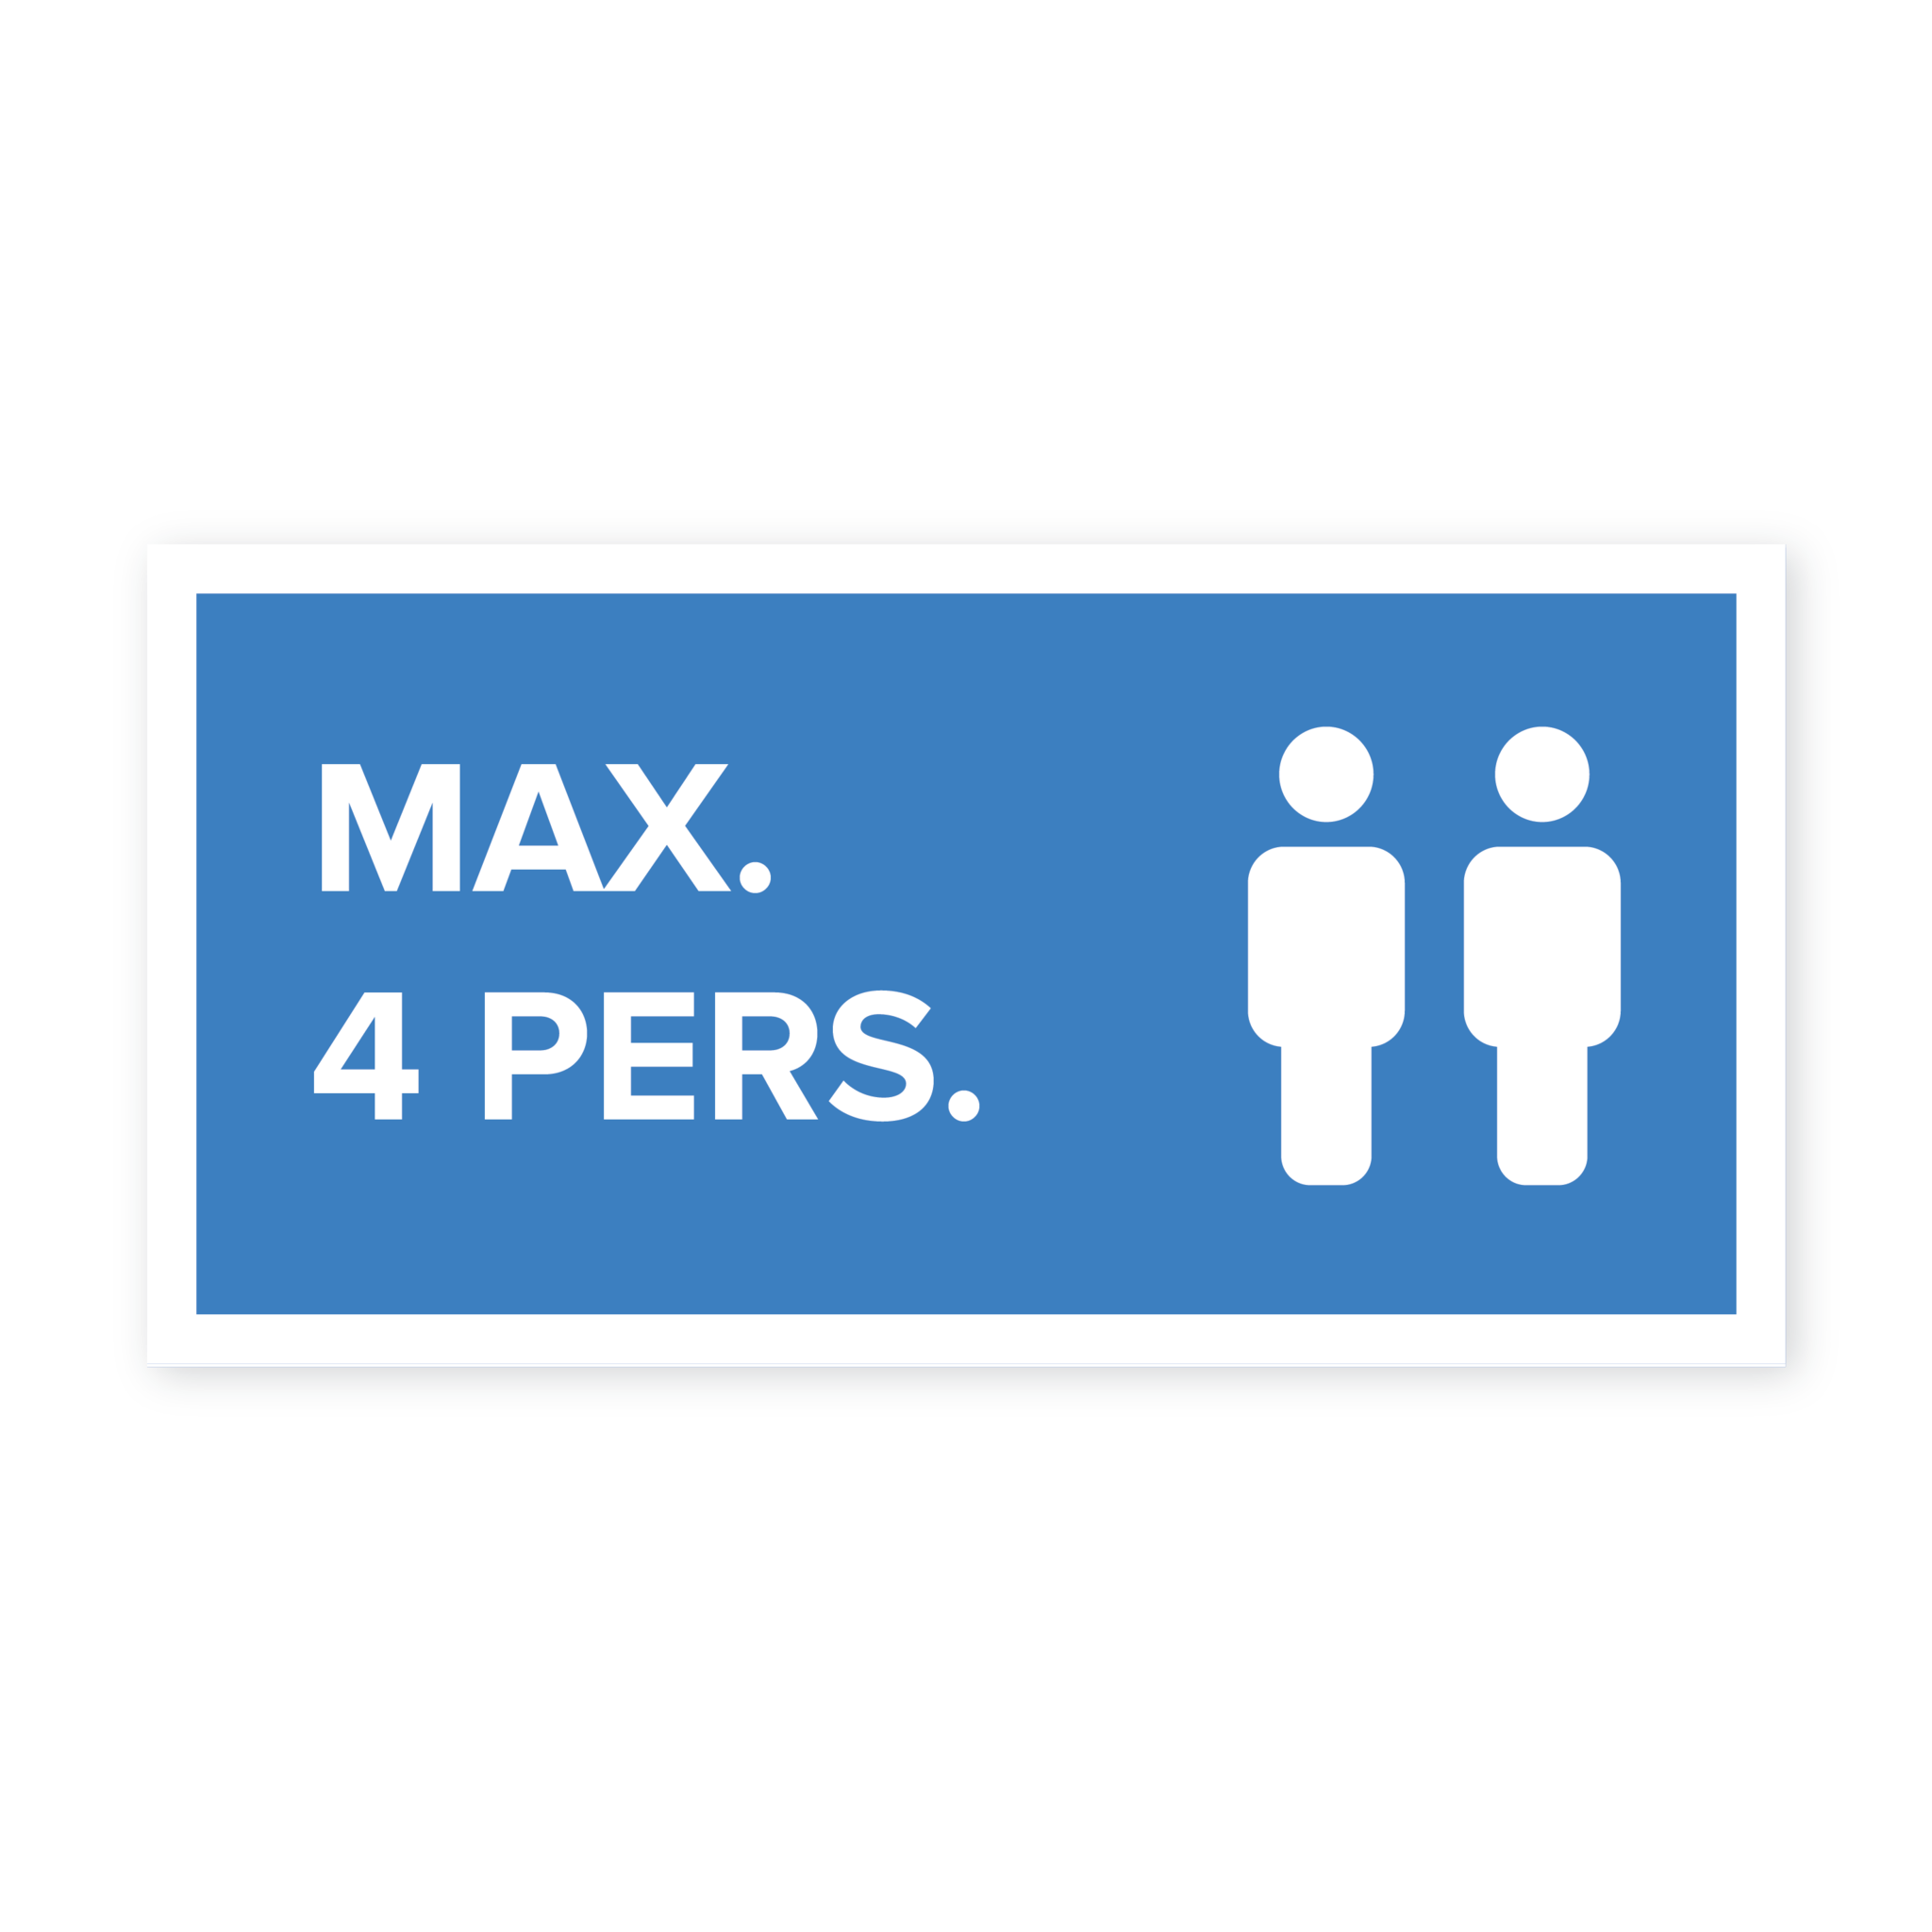 Max 4 pers. sticker